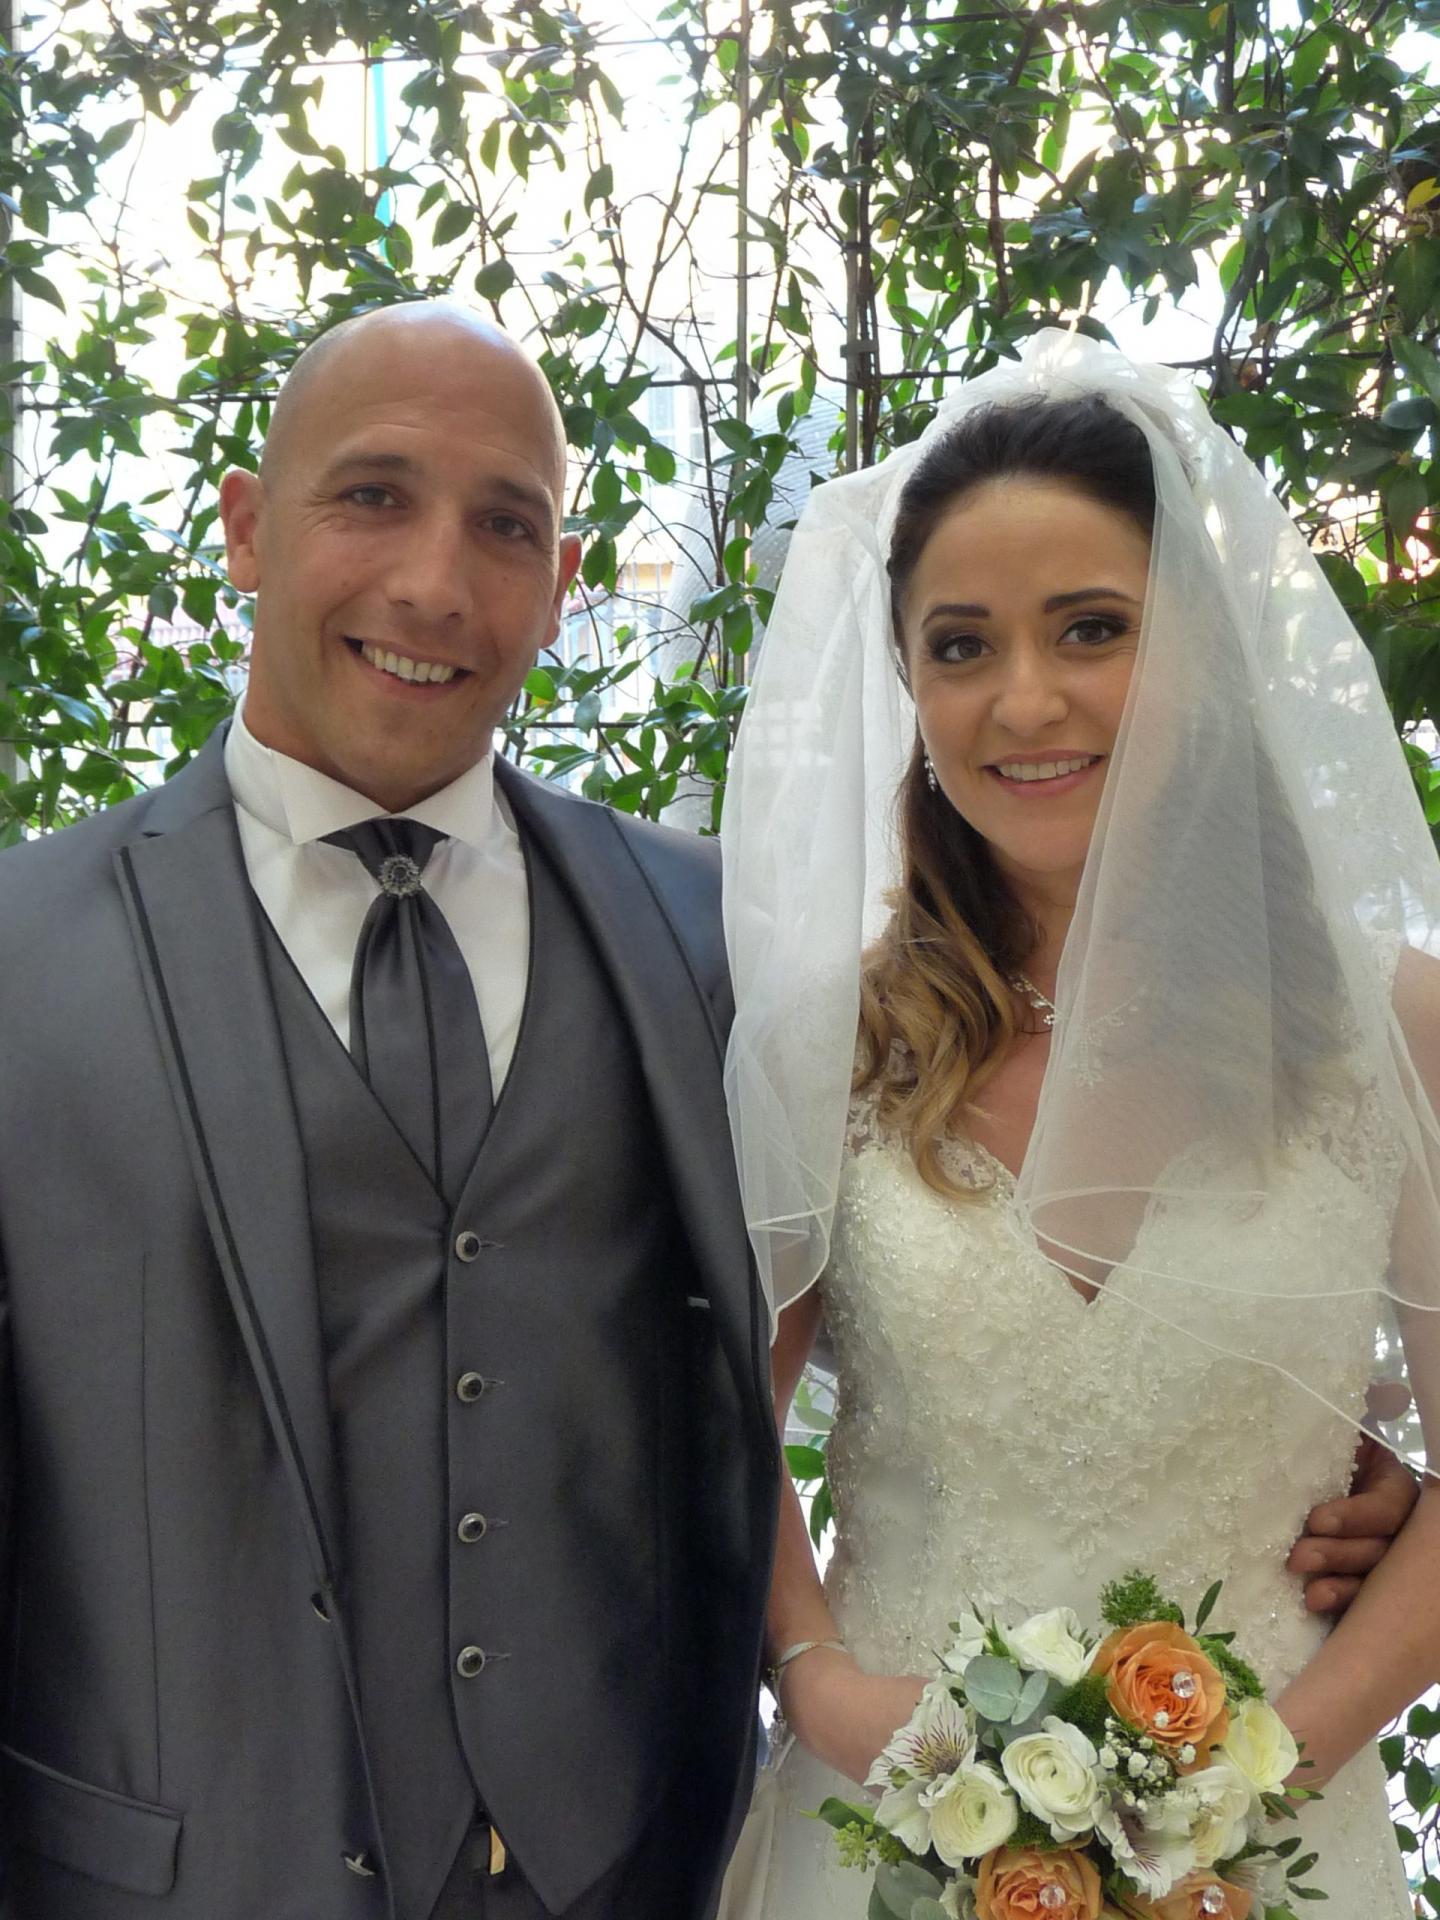 Steeve Saccone et Alice Muscat, employés de banque.